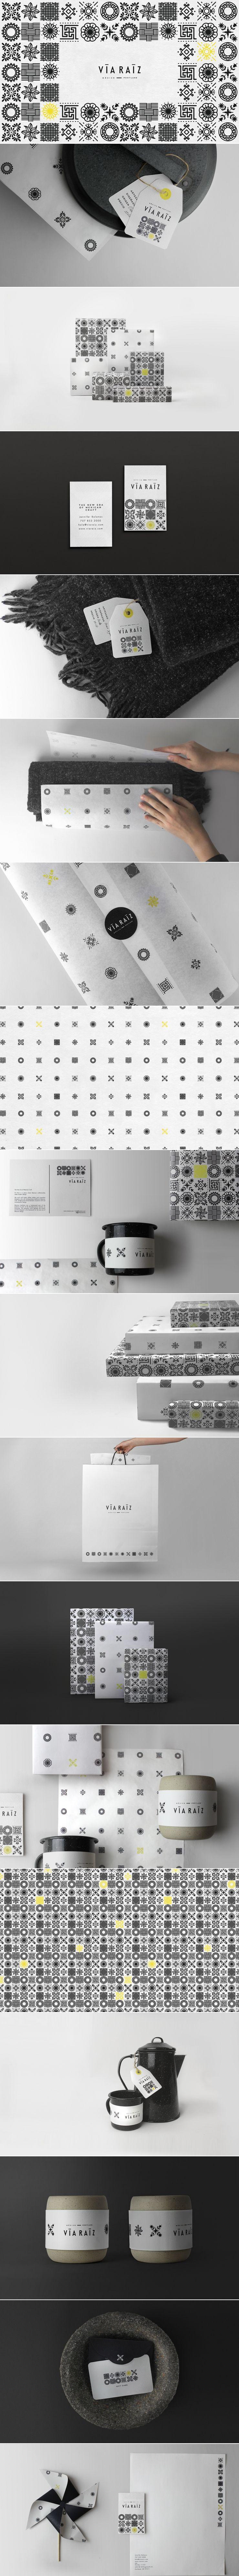 Via Raiz Modern Mexican Craft Design Store Brand Identity By Toro